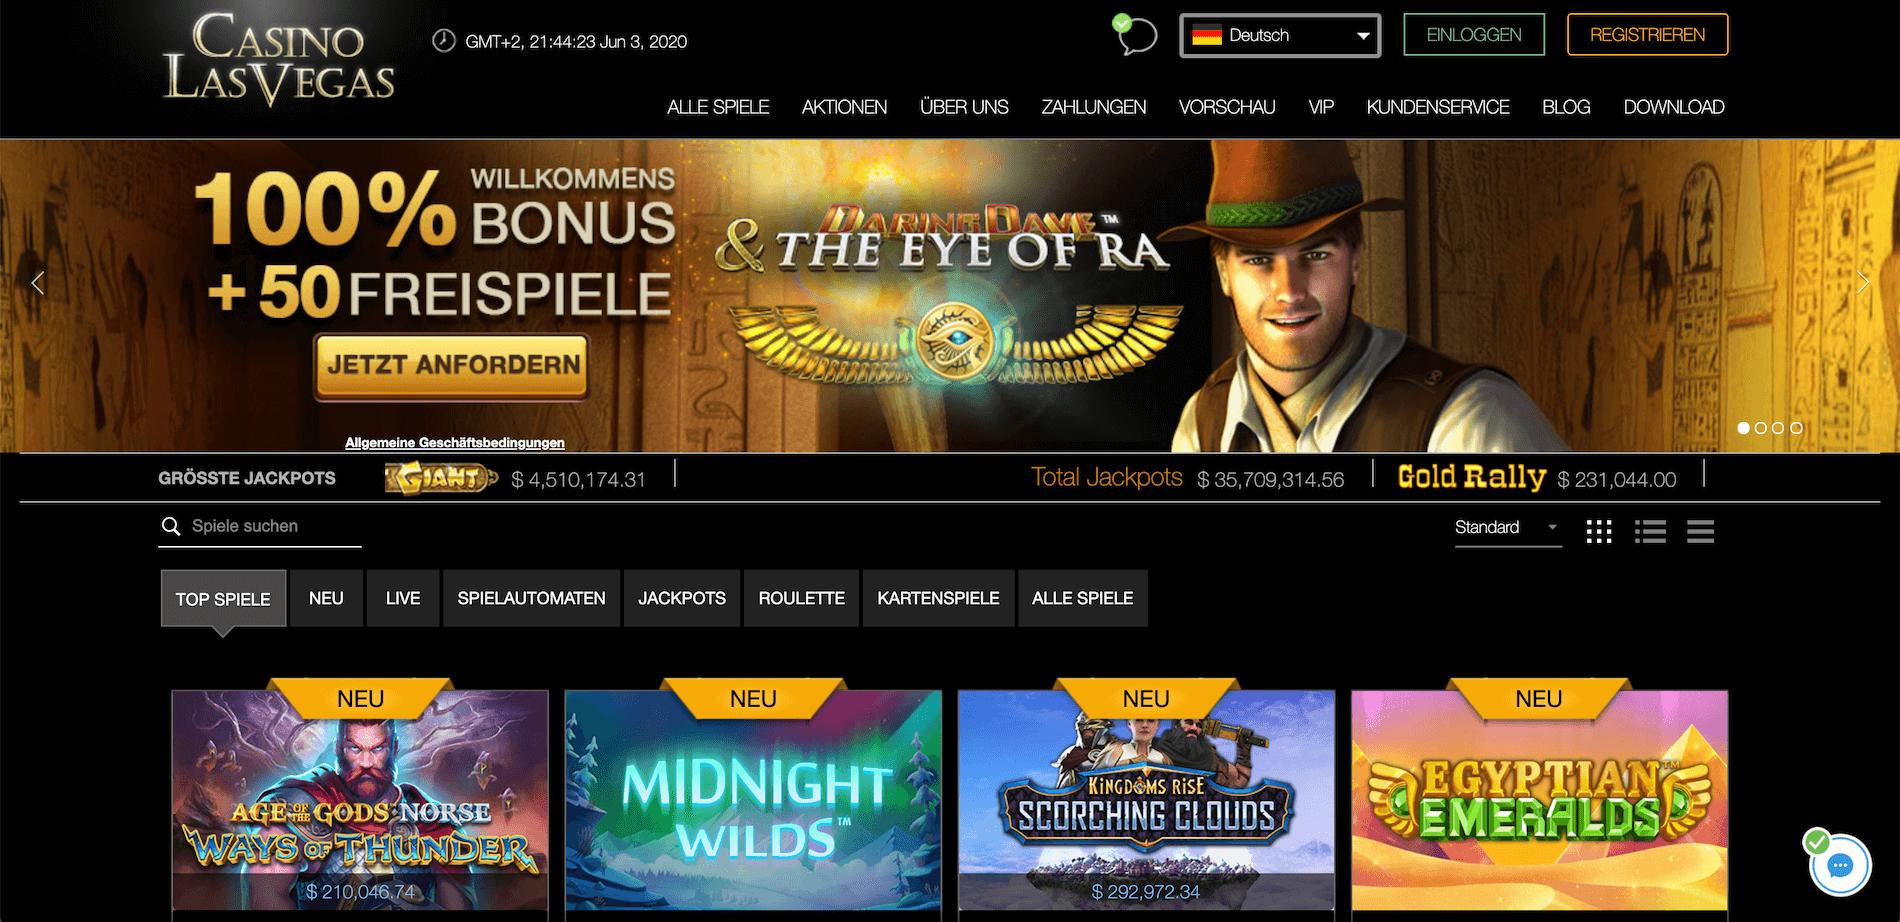 Casino LasVegas Startseite